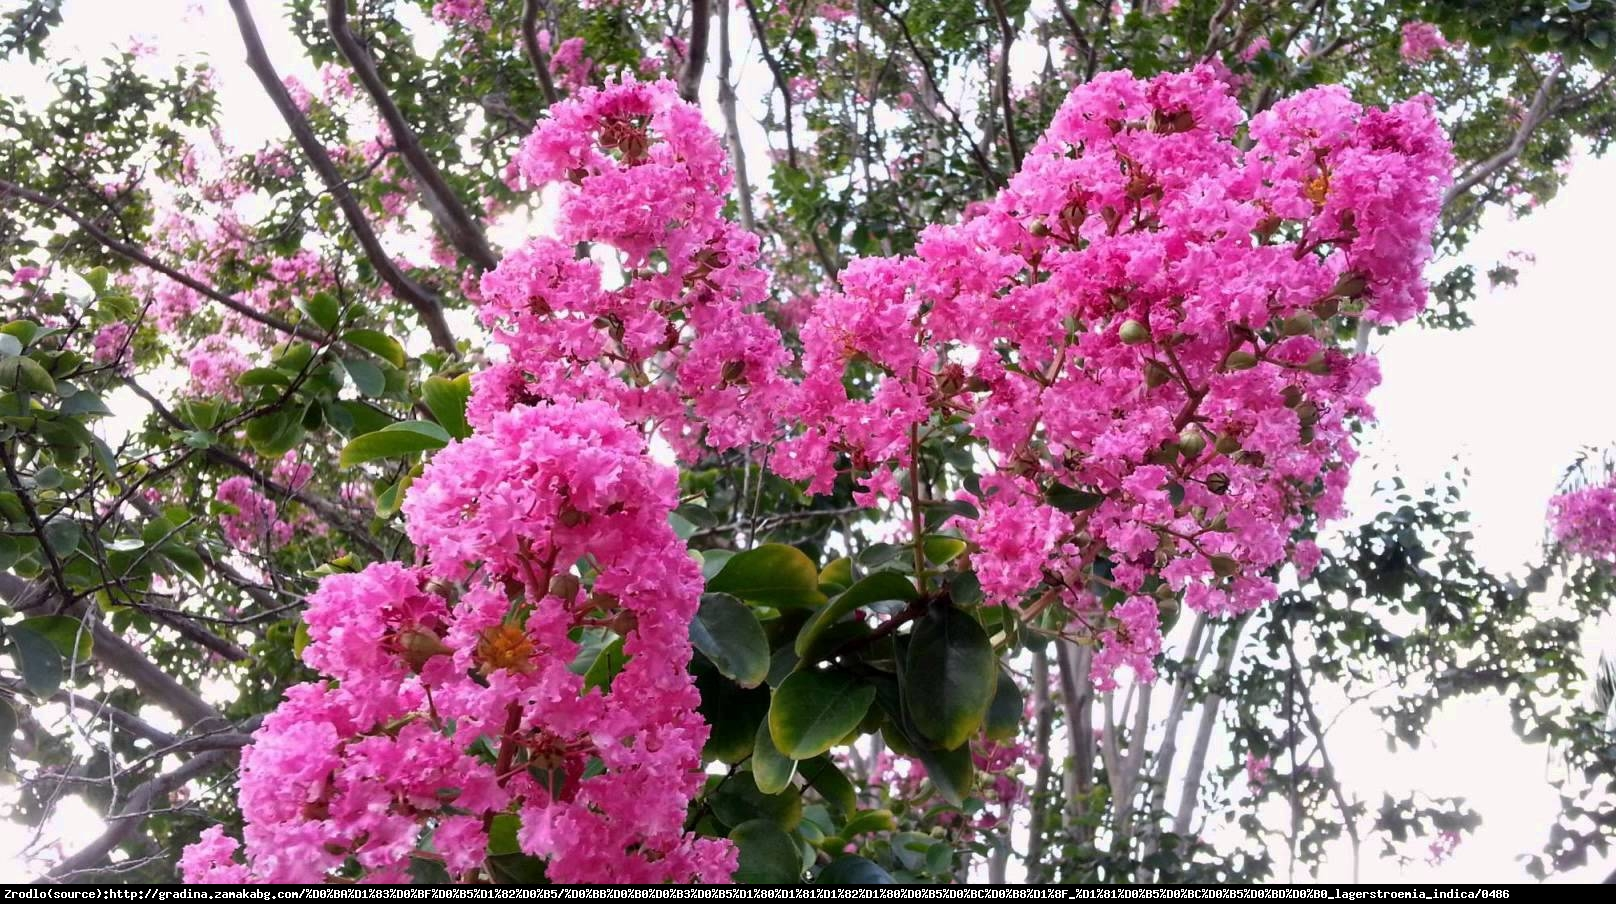 Lagerstremia indyjska Purpurea - Bez Południa - Lagerstroemia indica Purpurea